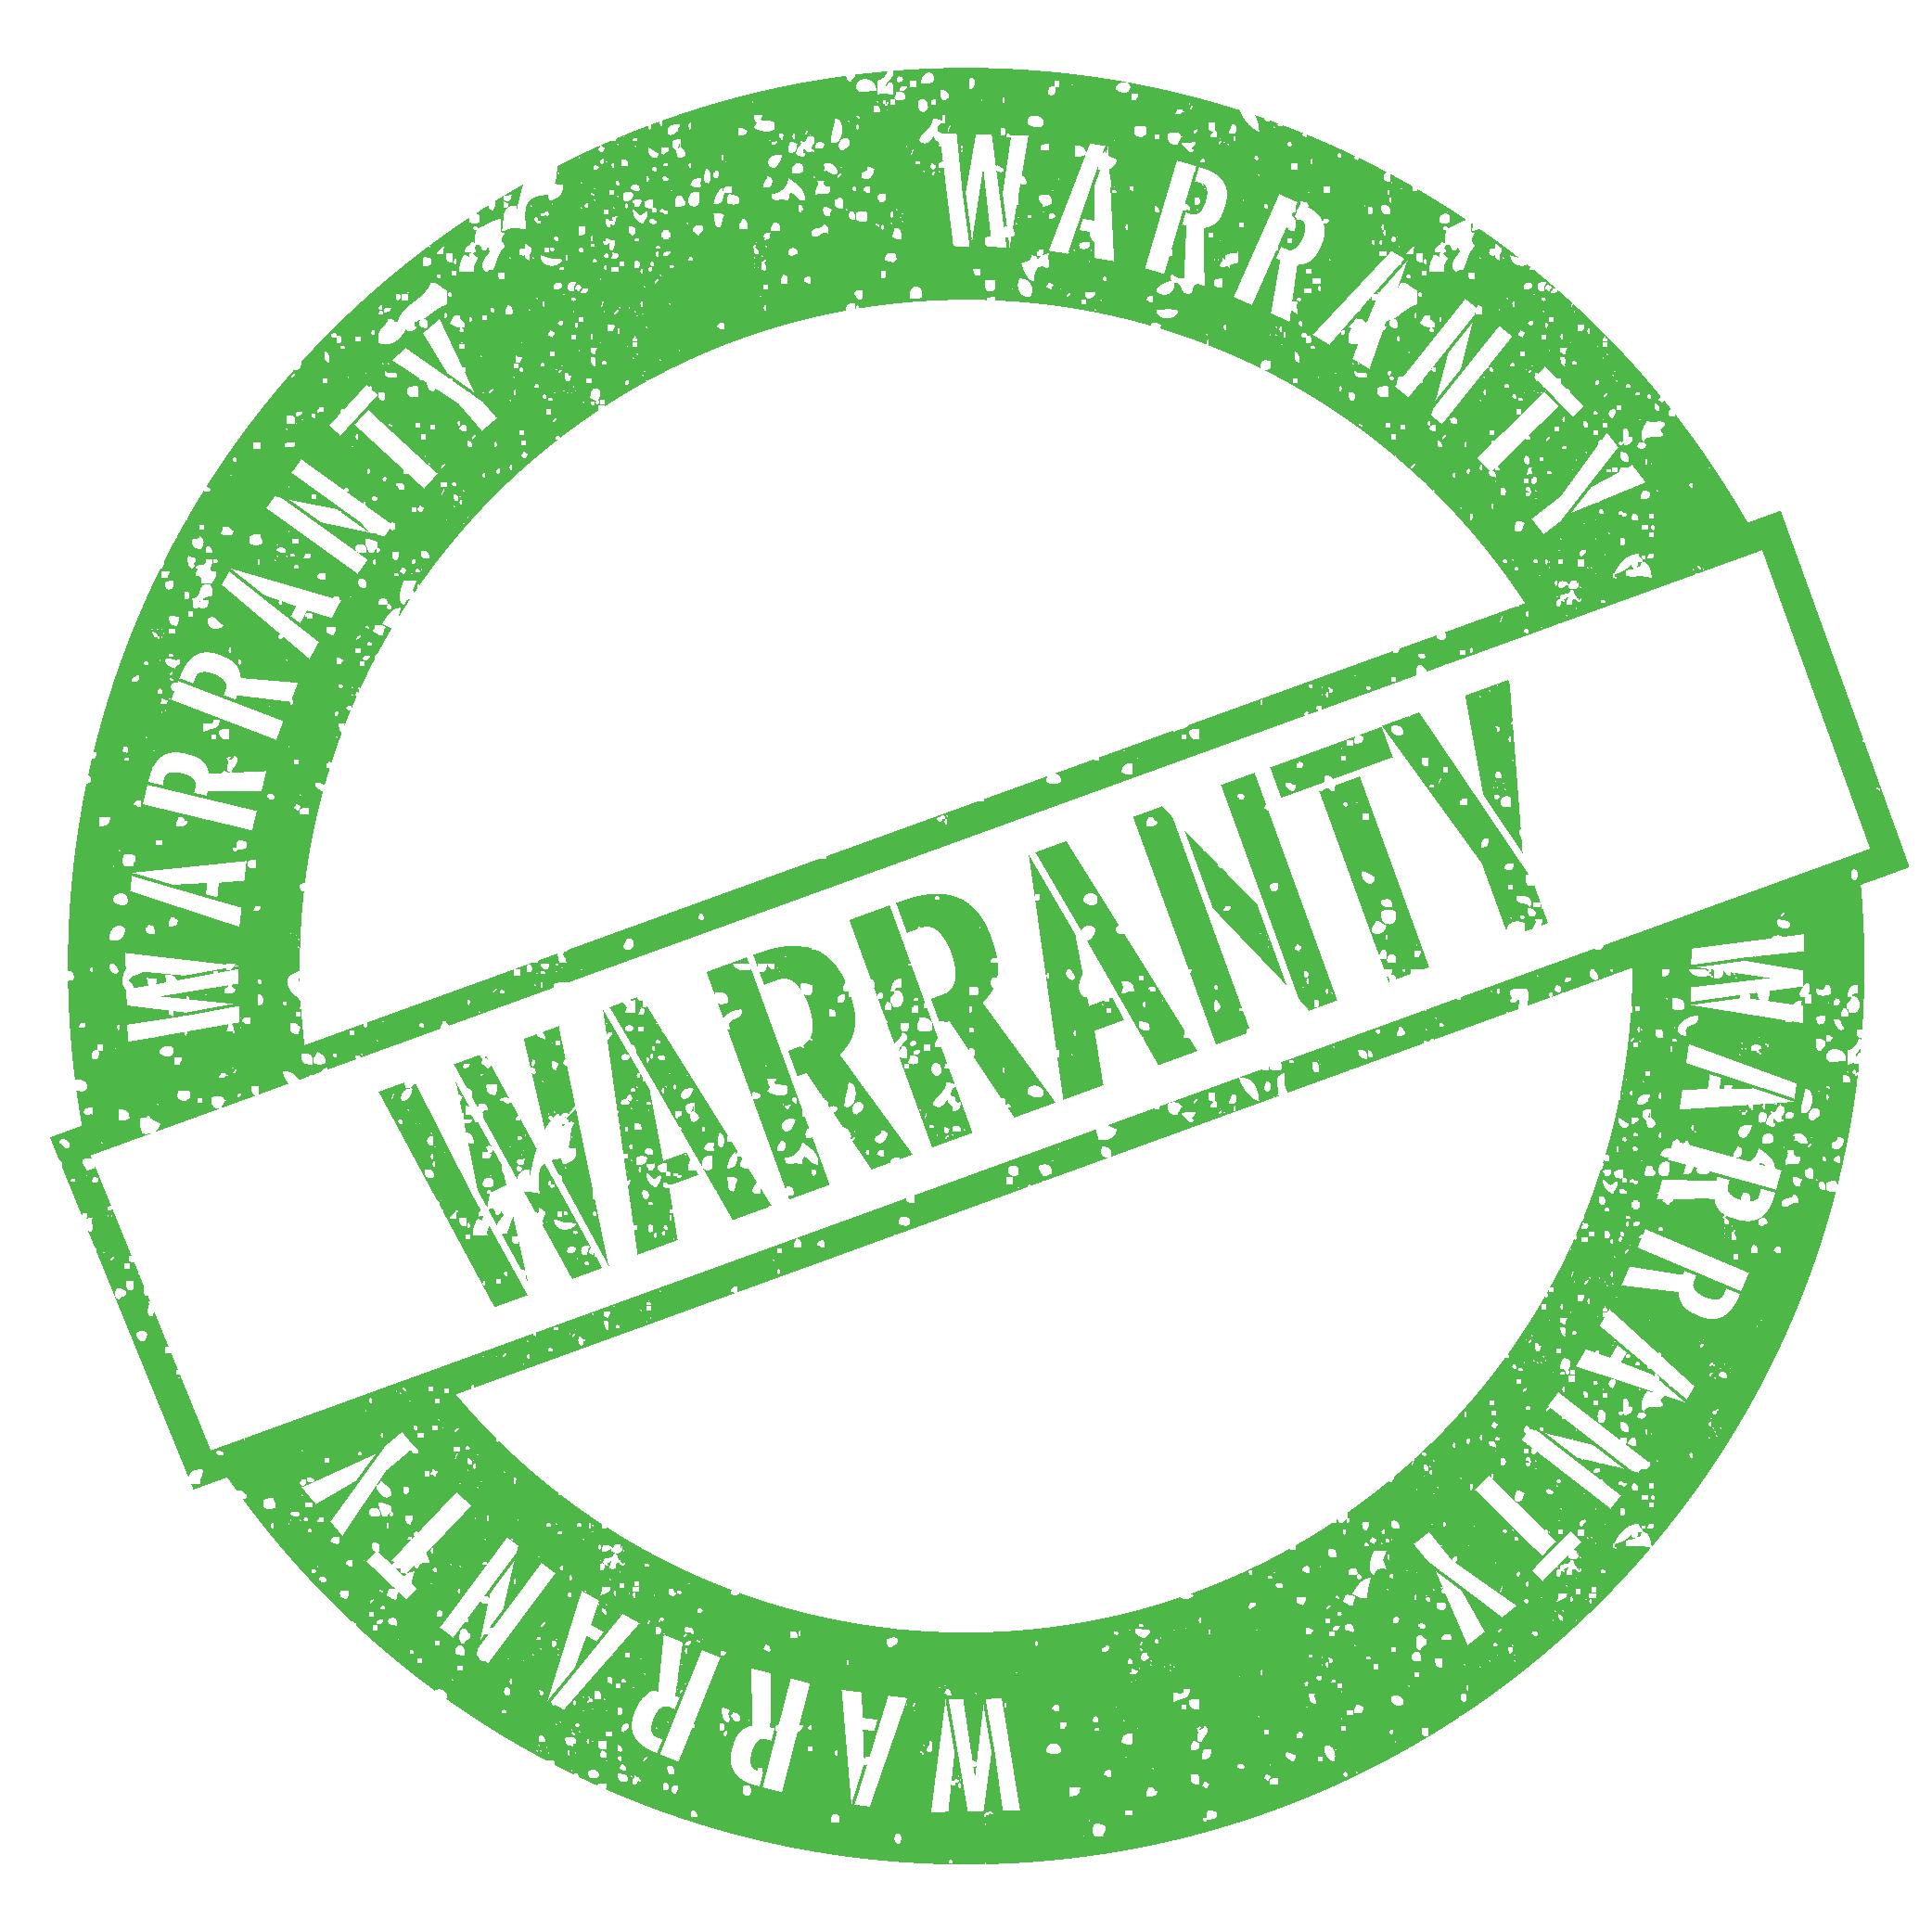 Warrantti